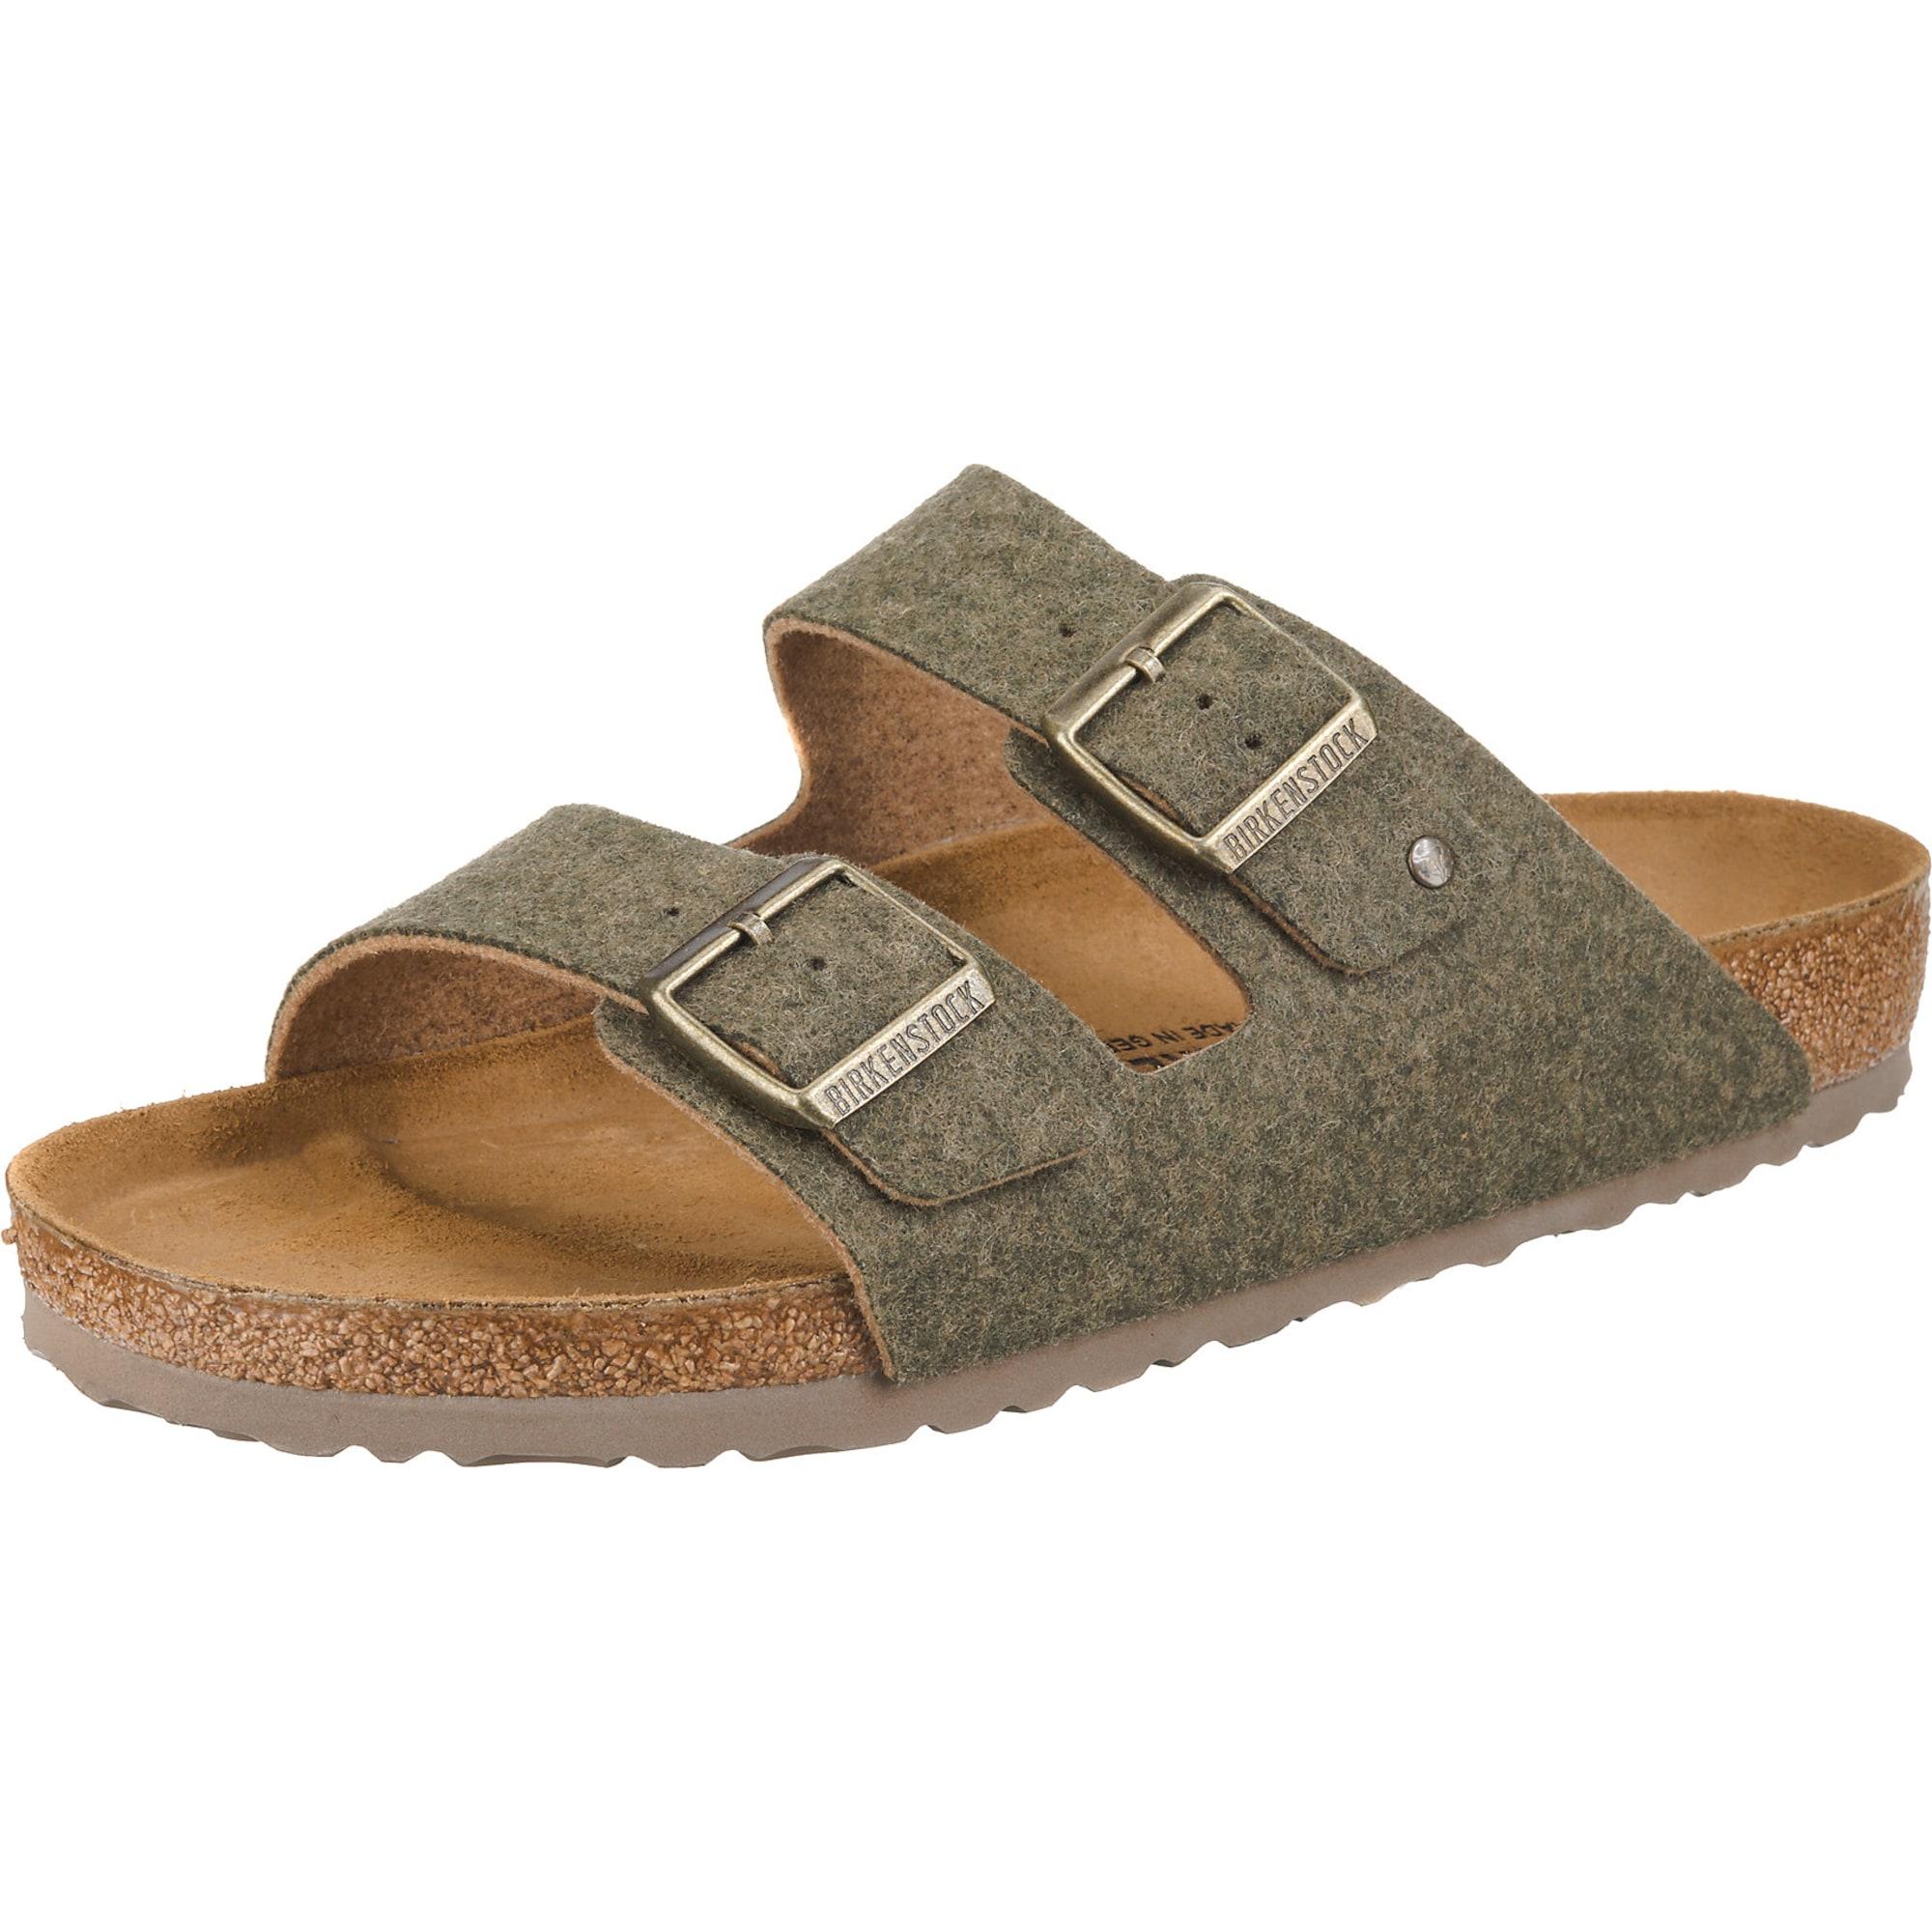 Arizona Pantoletten | Schuhe > Clogs & Pantoletten > Pantoletten | Braun | Birkenstock